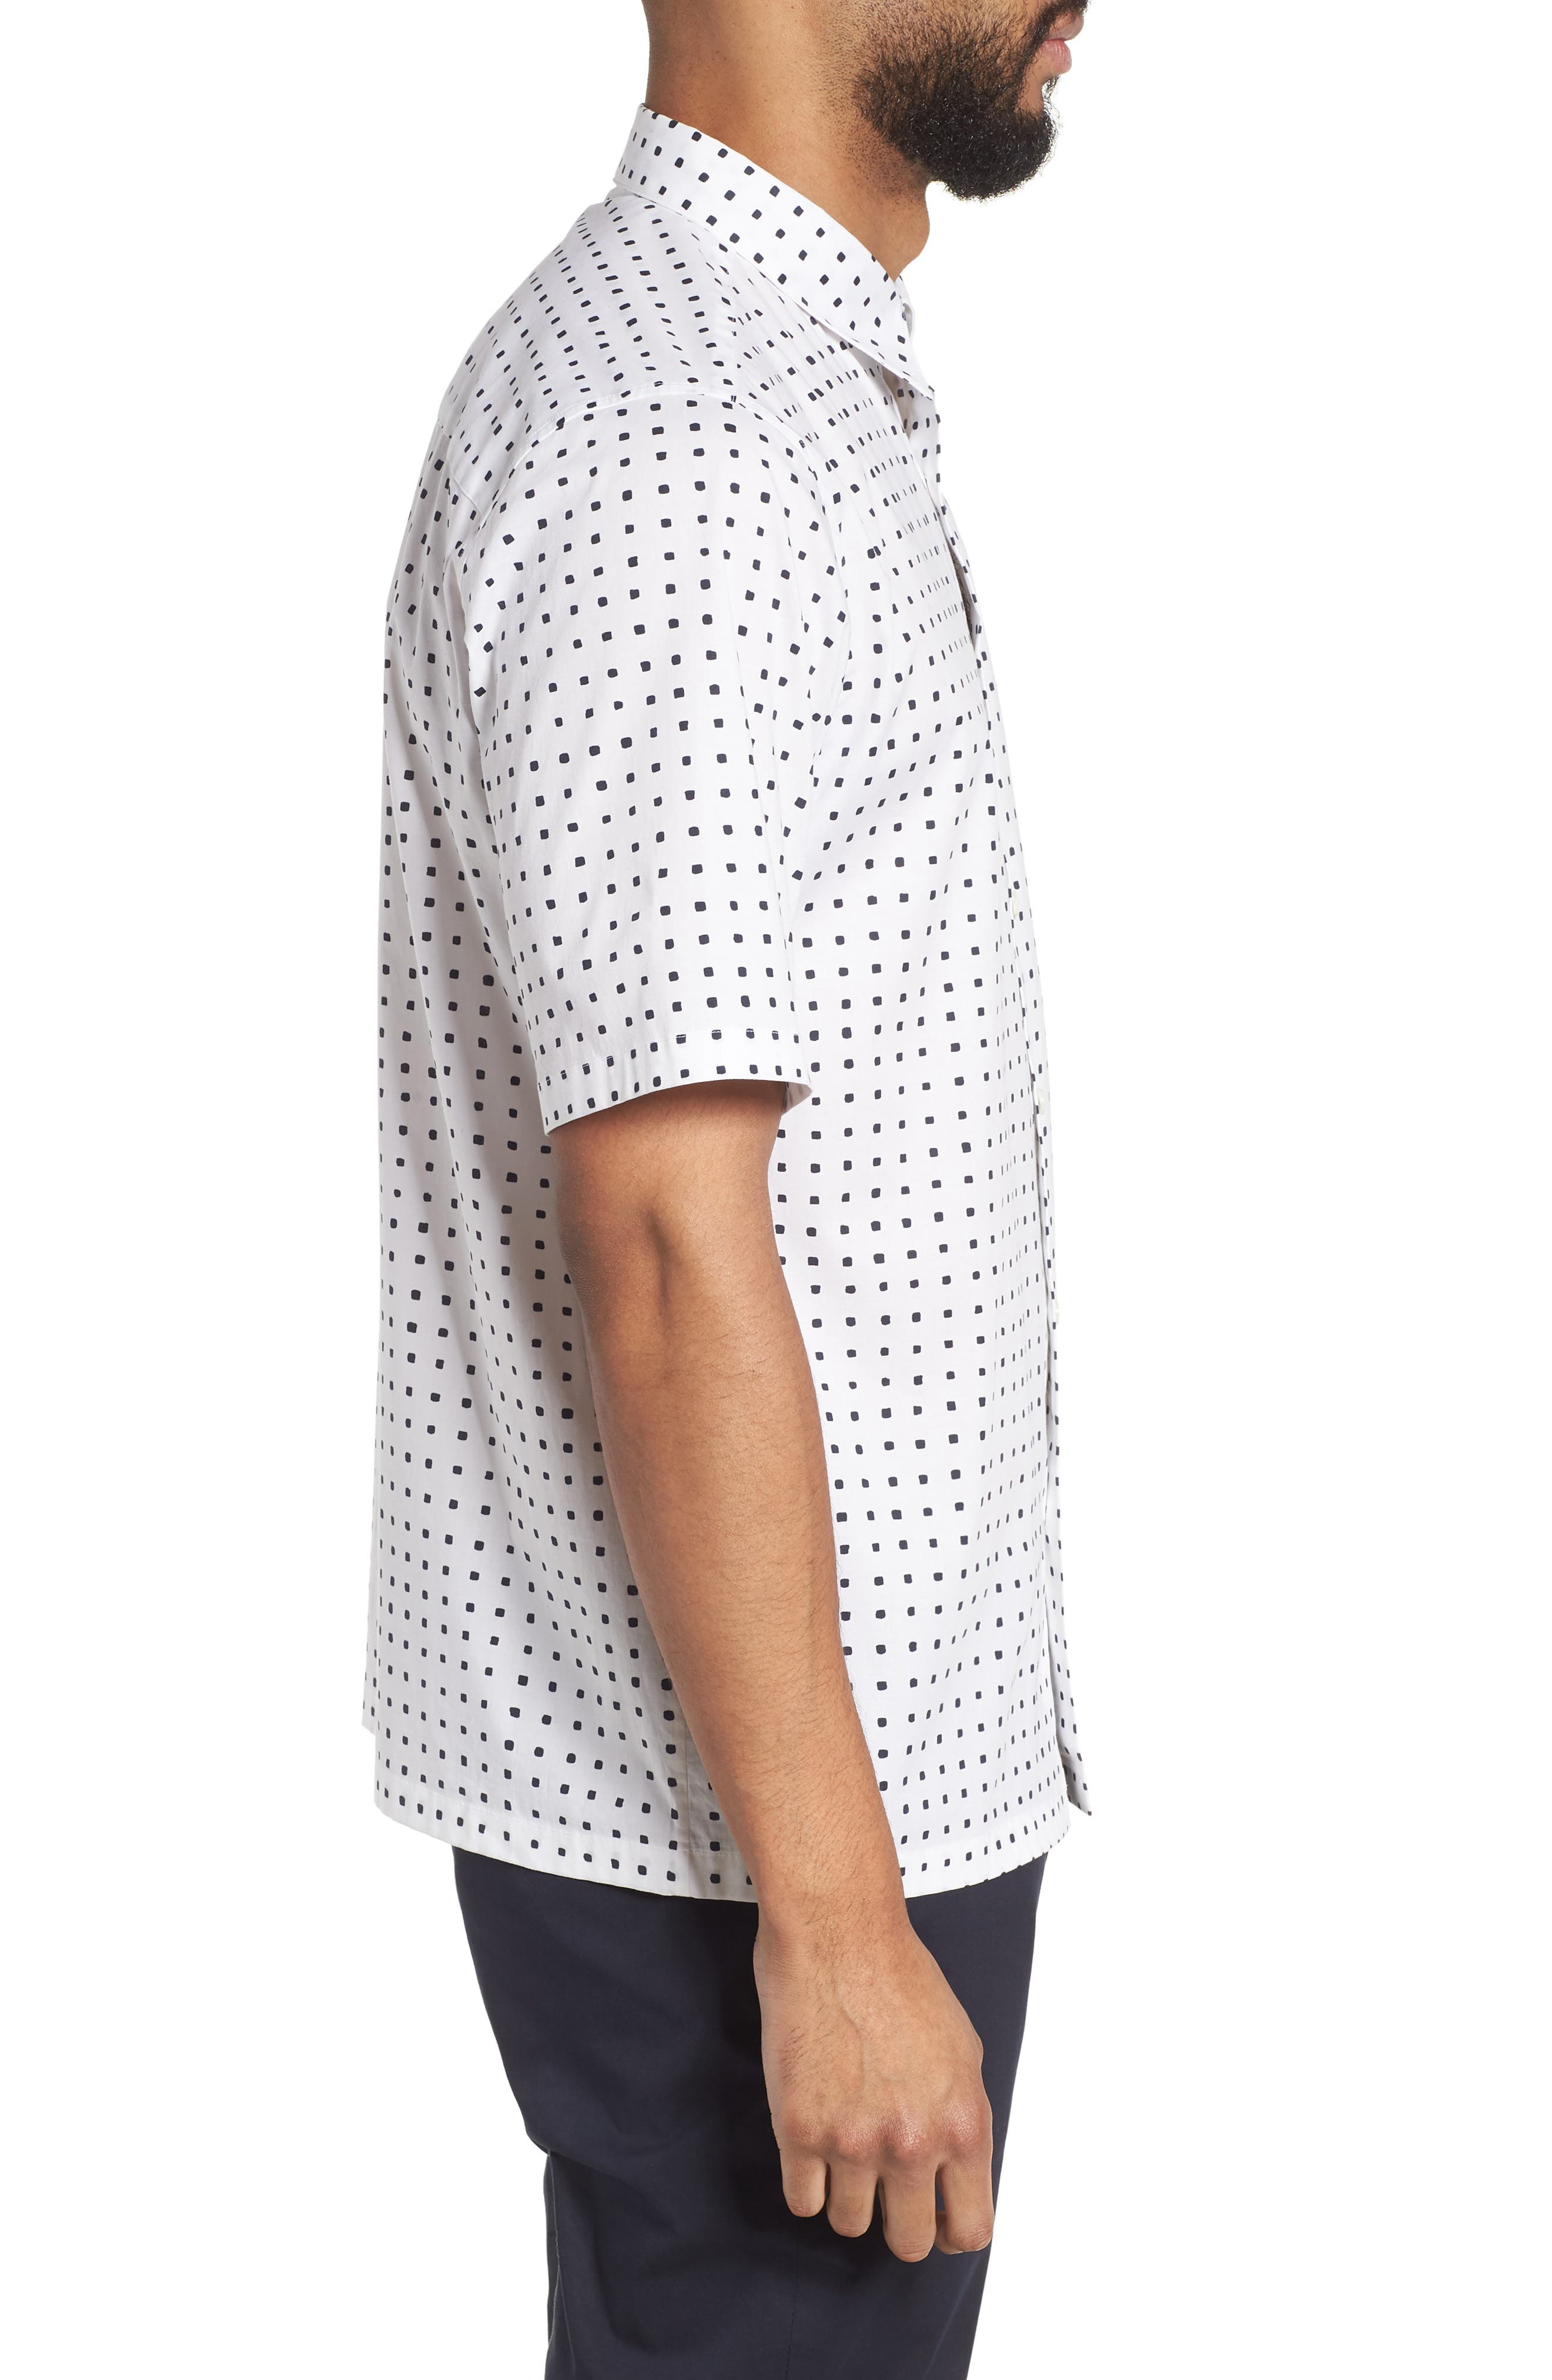 Bruner Trim Fit Dot Short Sleeve Sport Shirt,                             Alternate thumbnail 3, color,                             110